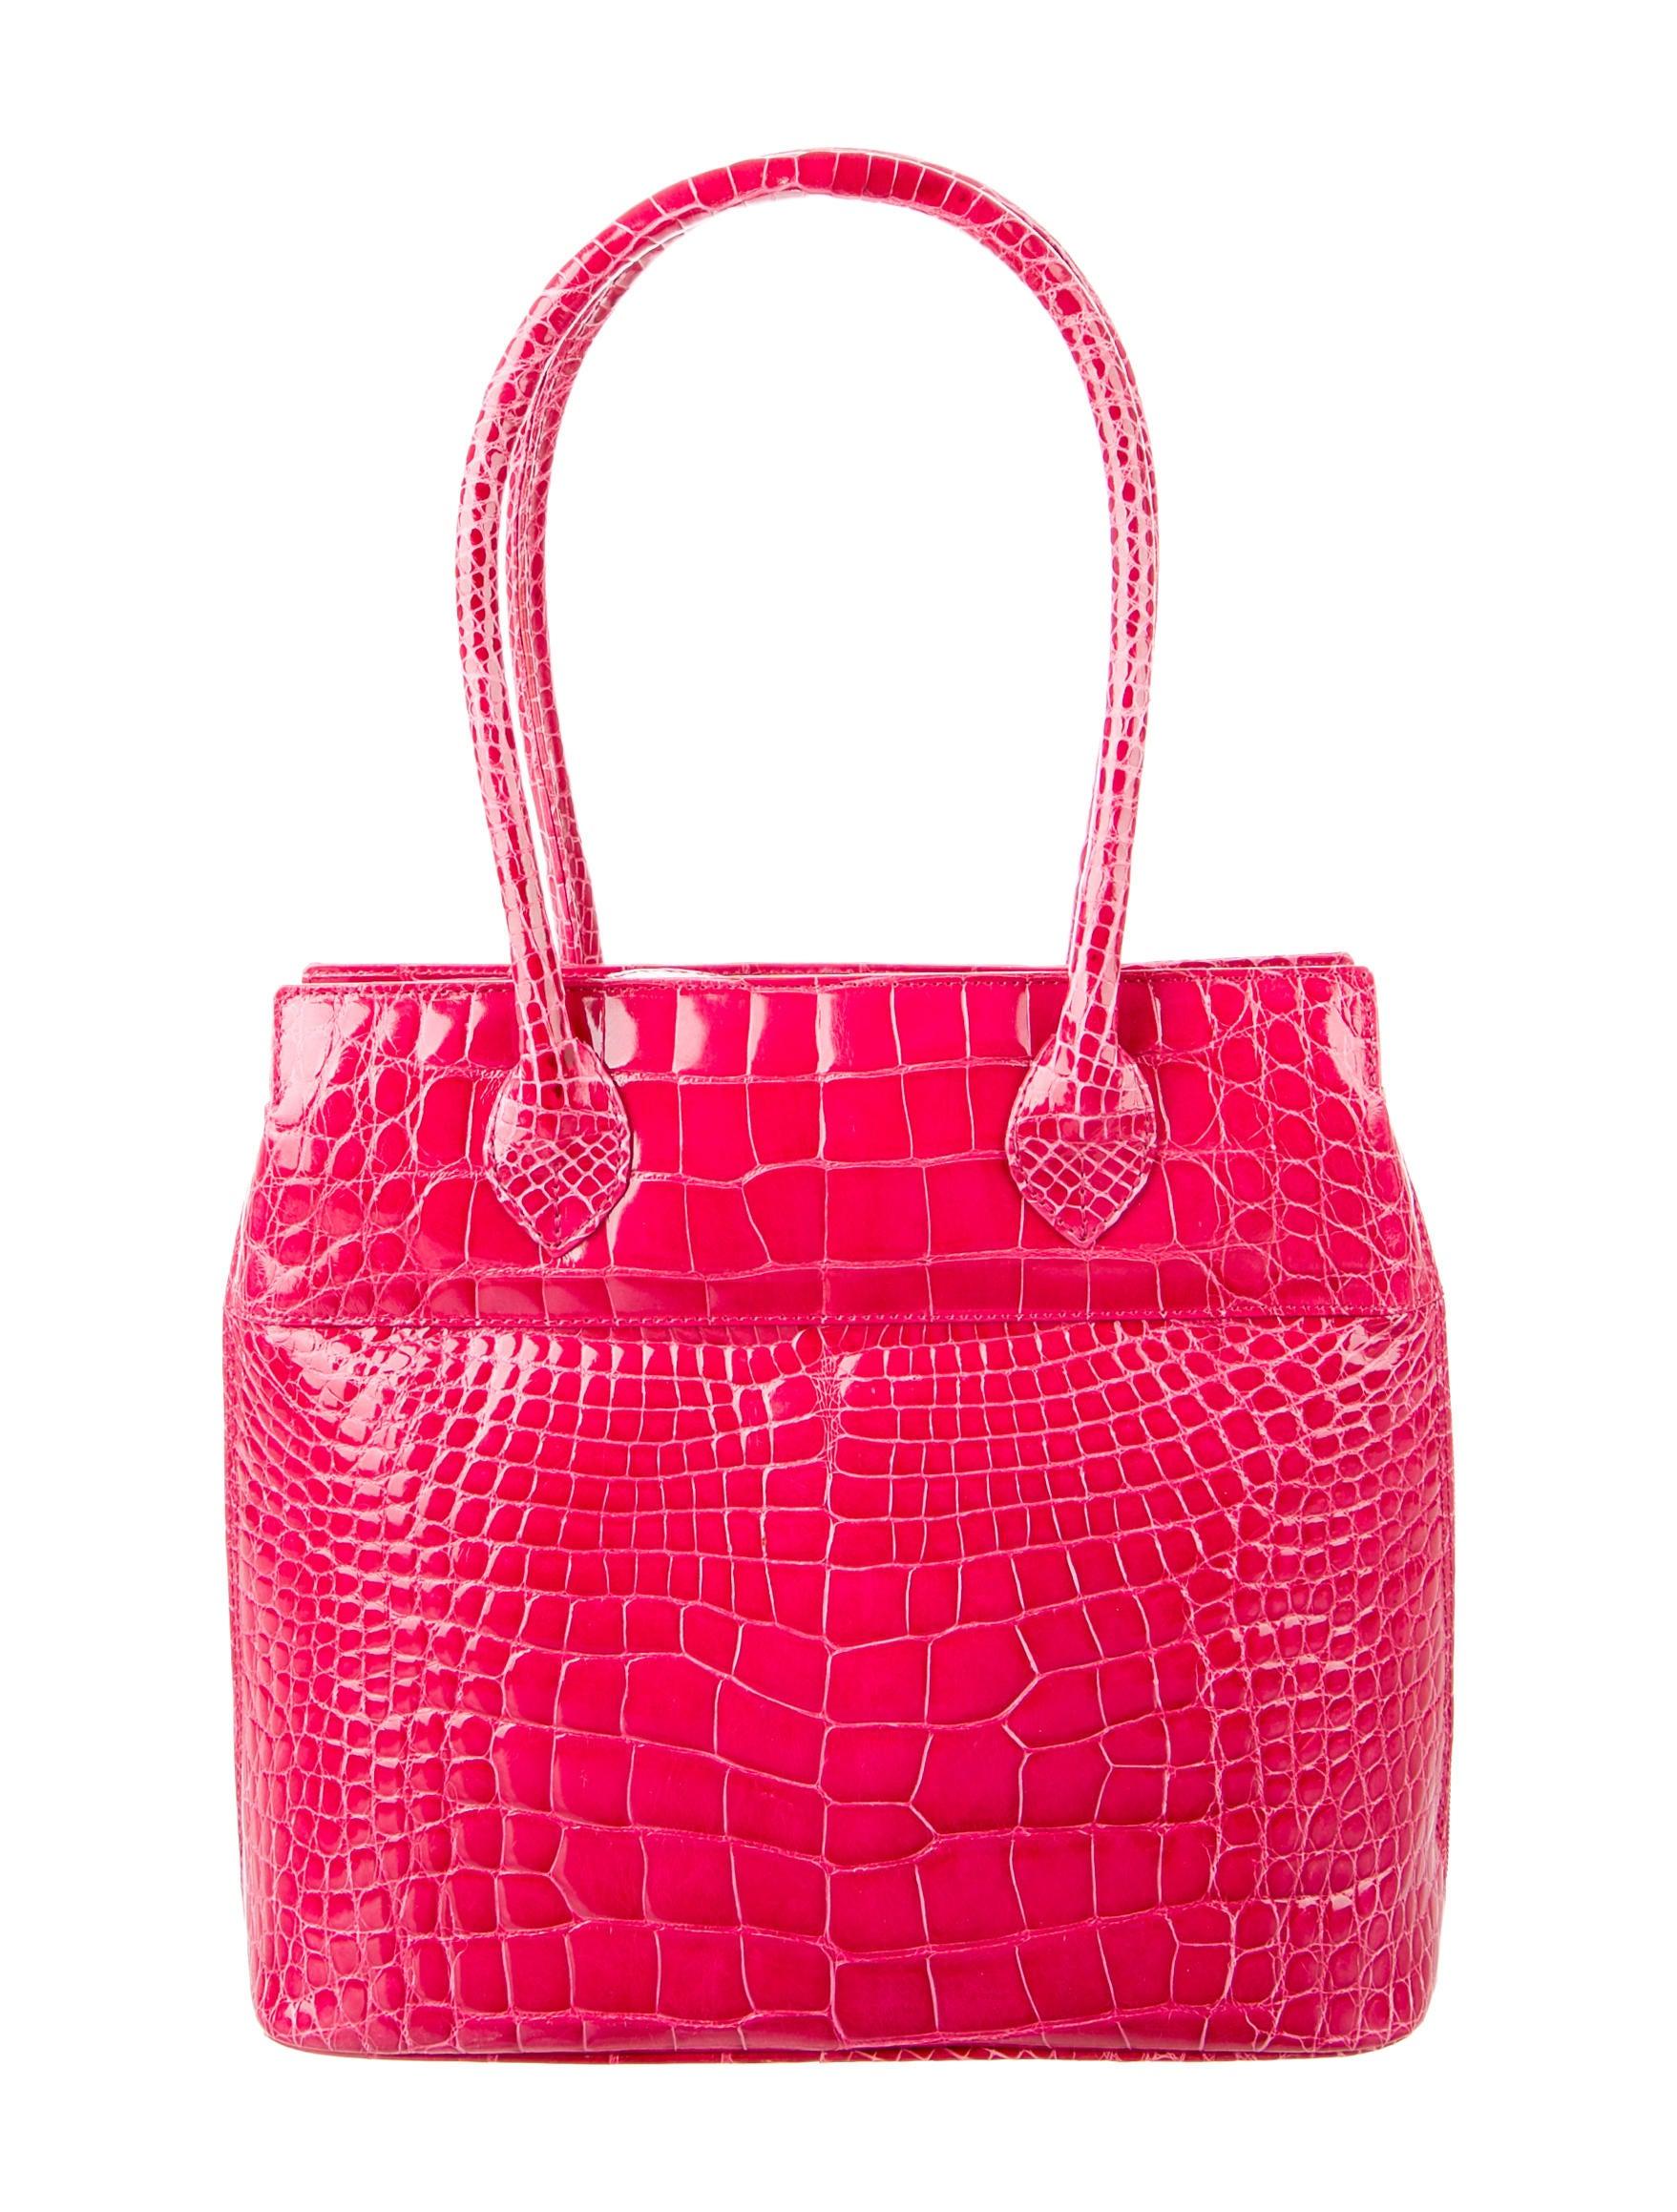 Lana marks handbags shop online